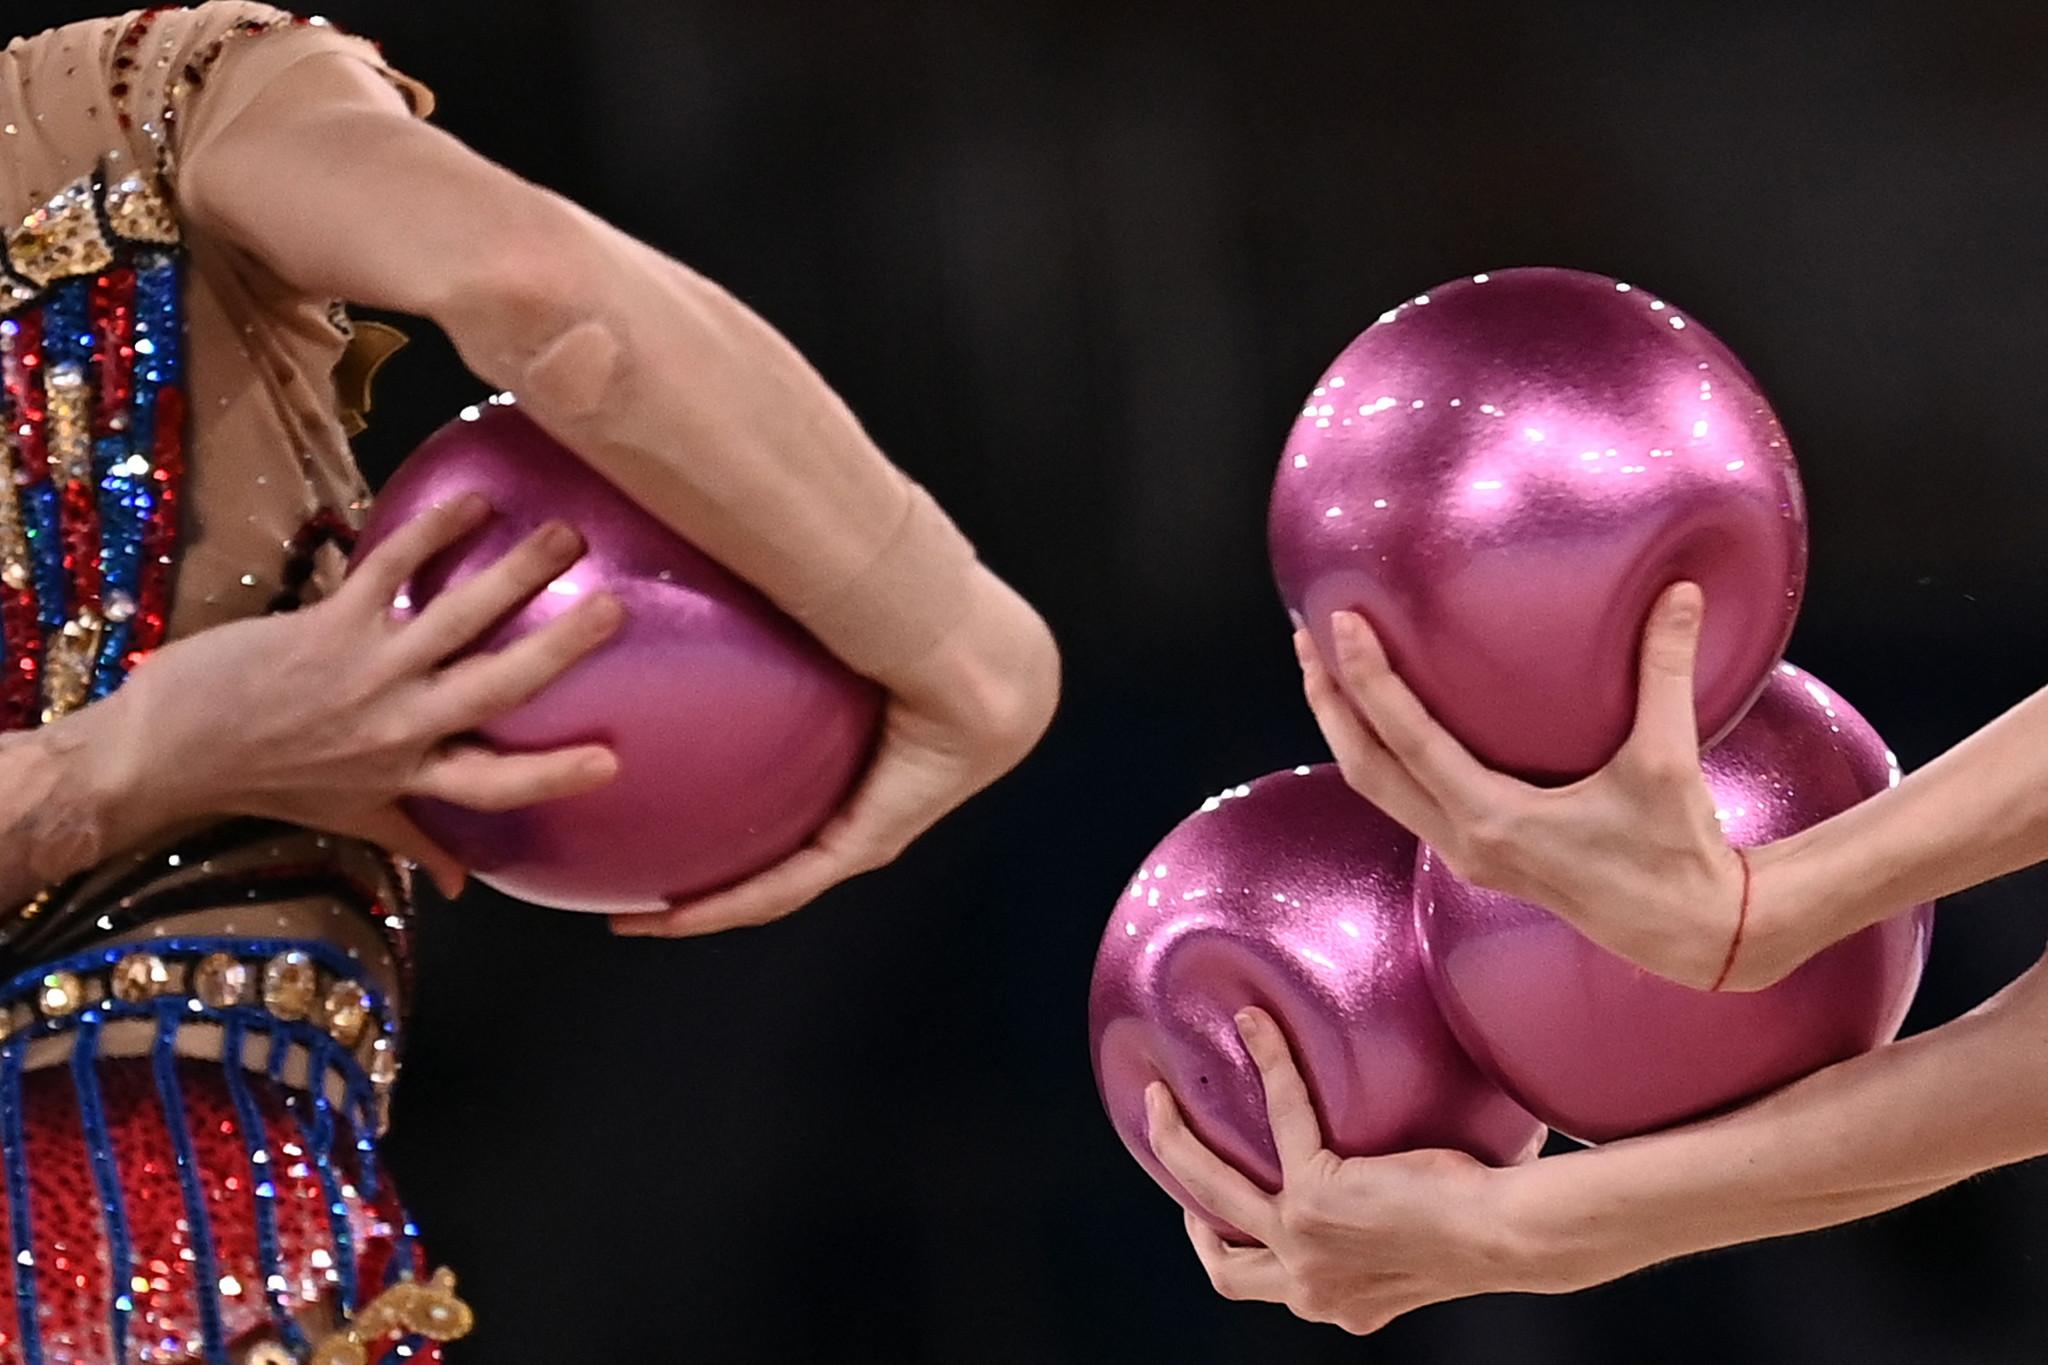 Spectators to be permitted at Gymnastics World Championships in Kitakyushu